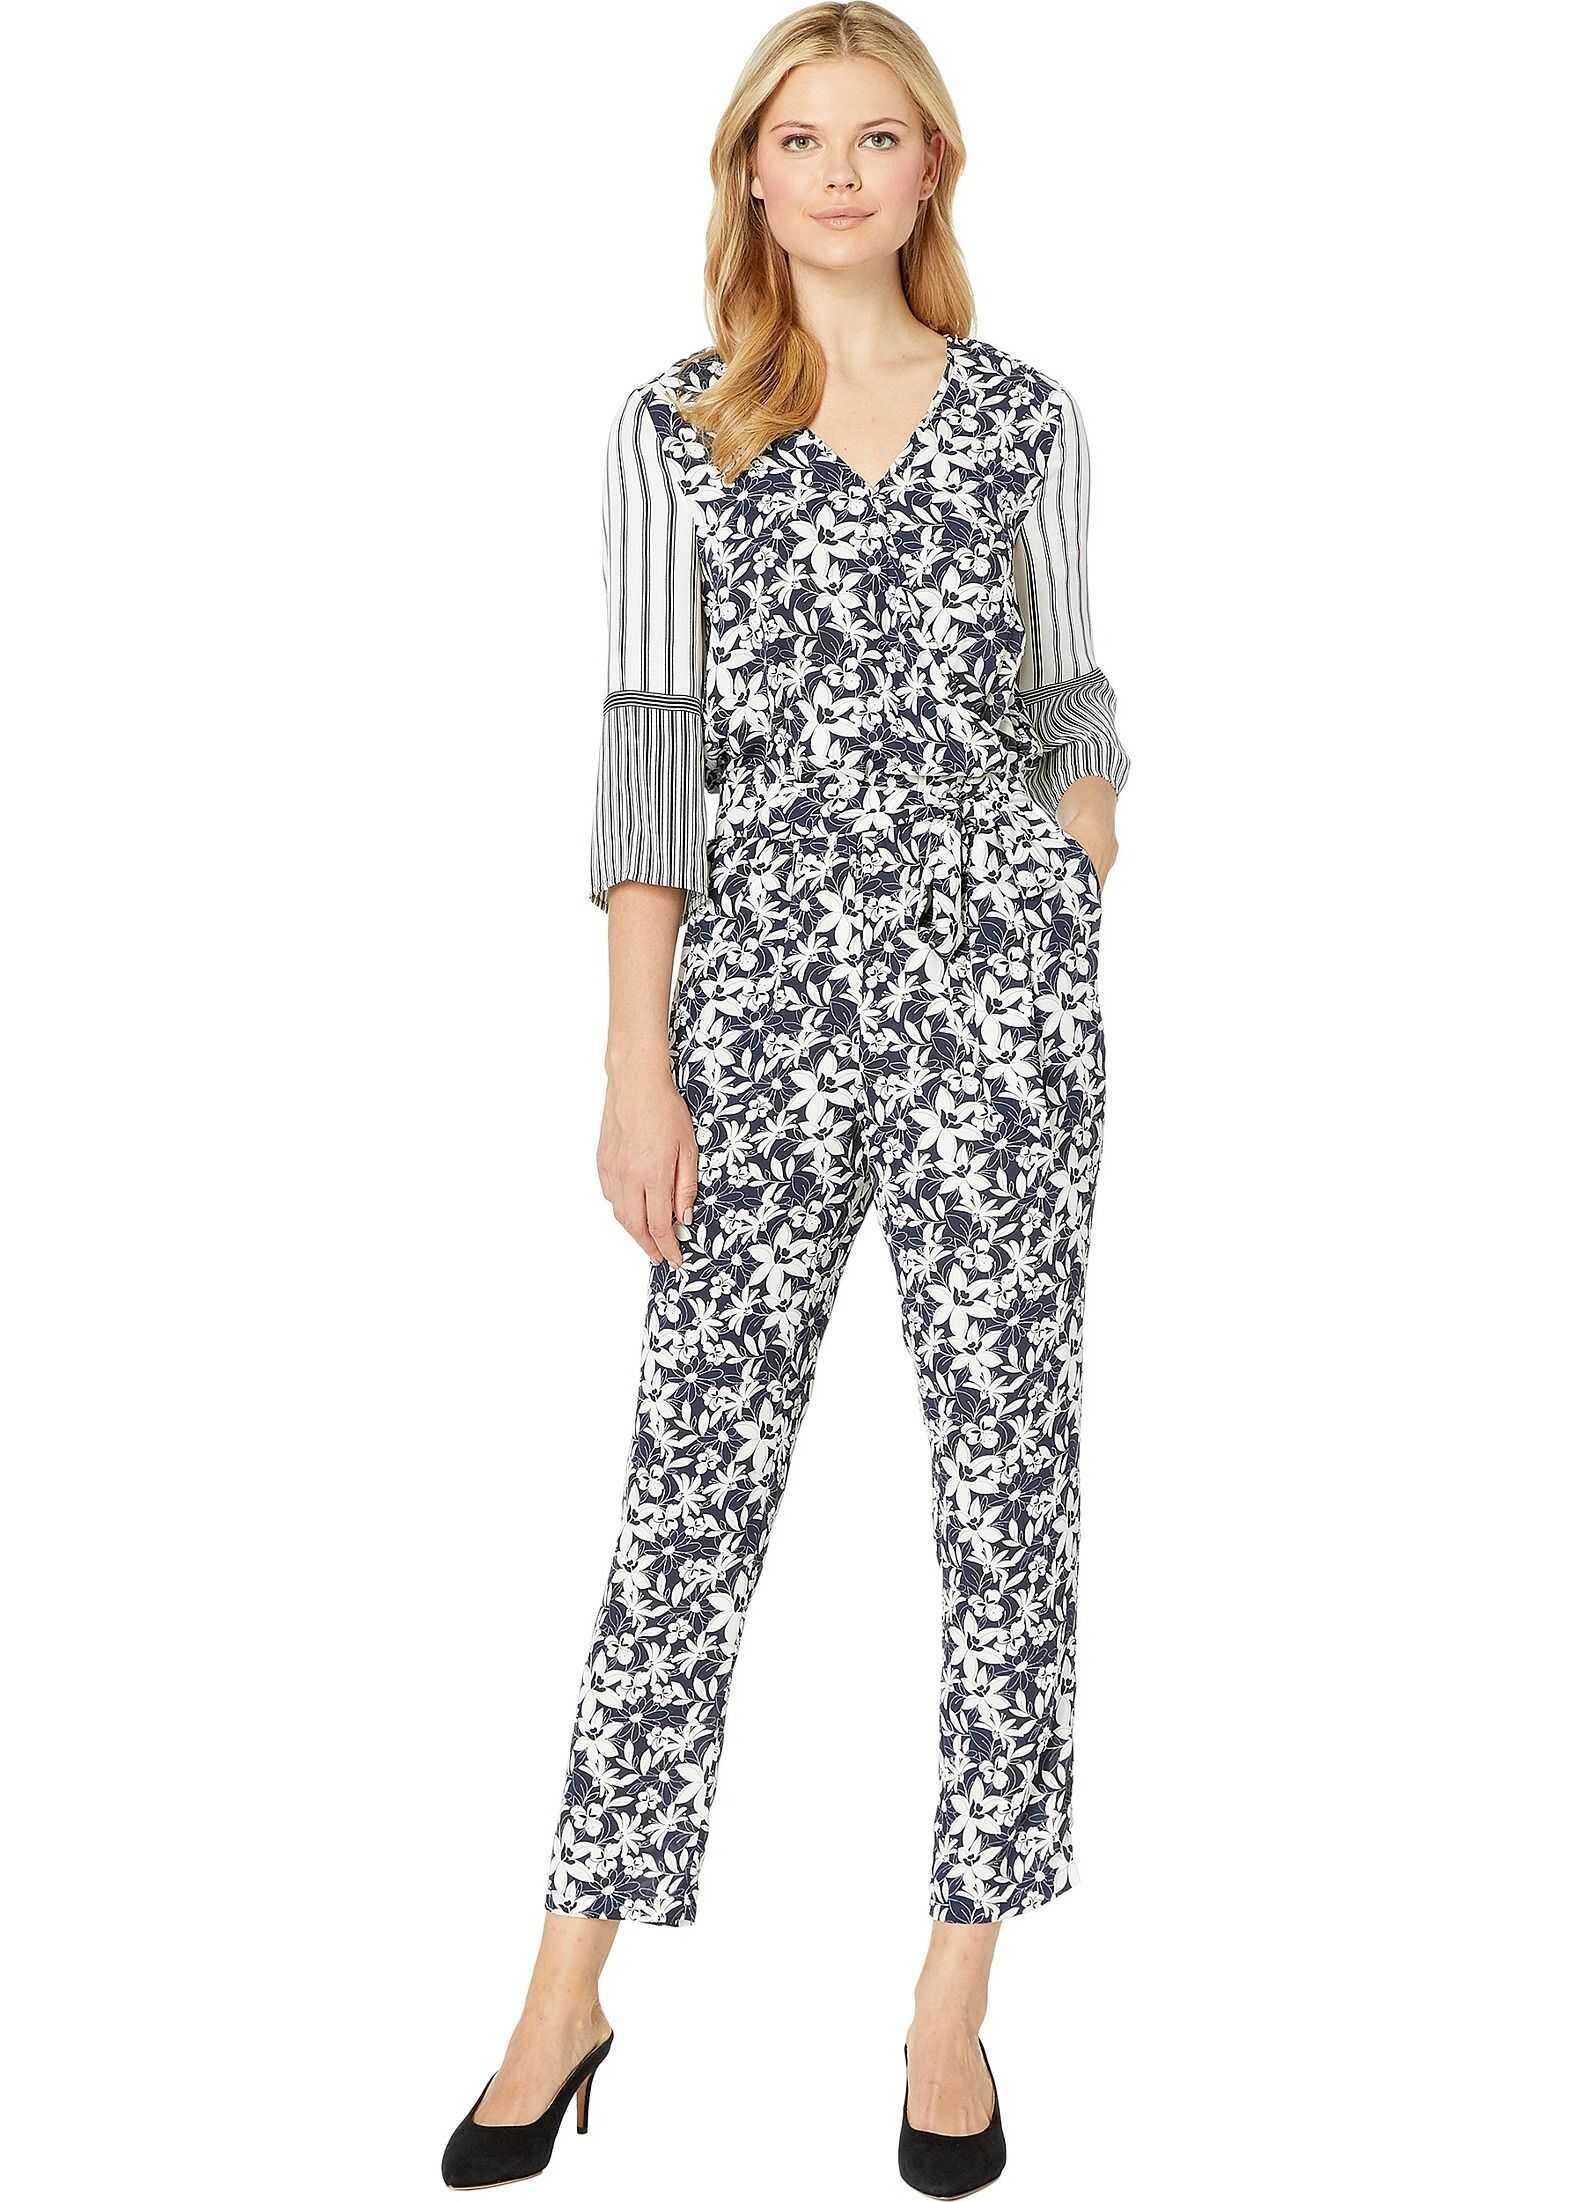 Vince Camuto 3/4 Sleeve Floral Lace Mix Print Jumpsuit Classic Navy